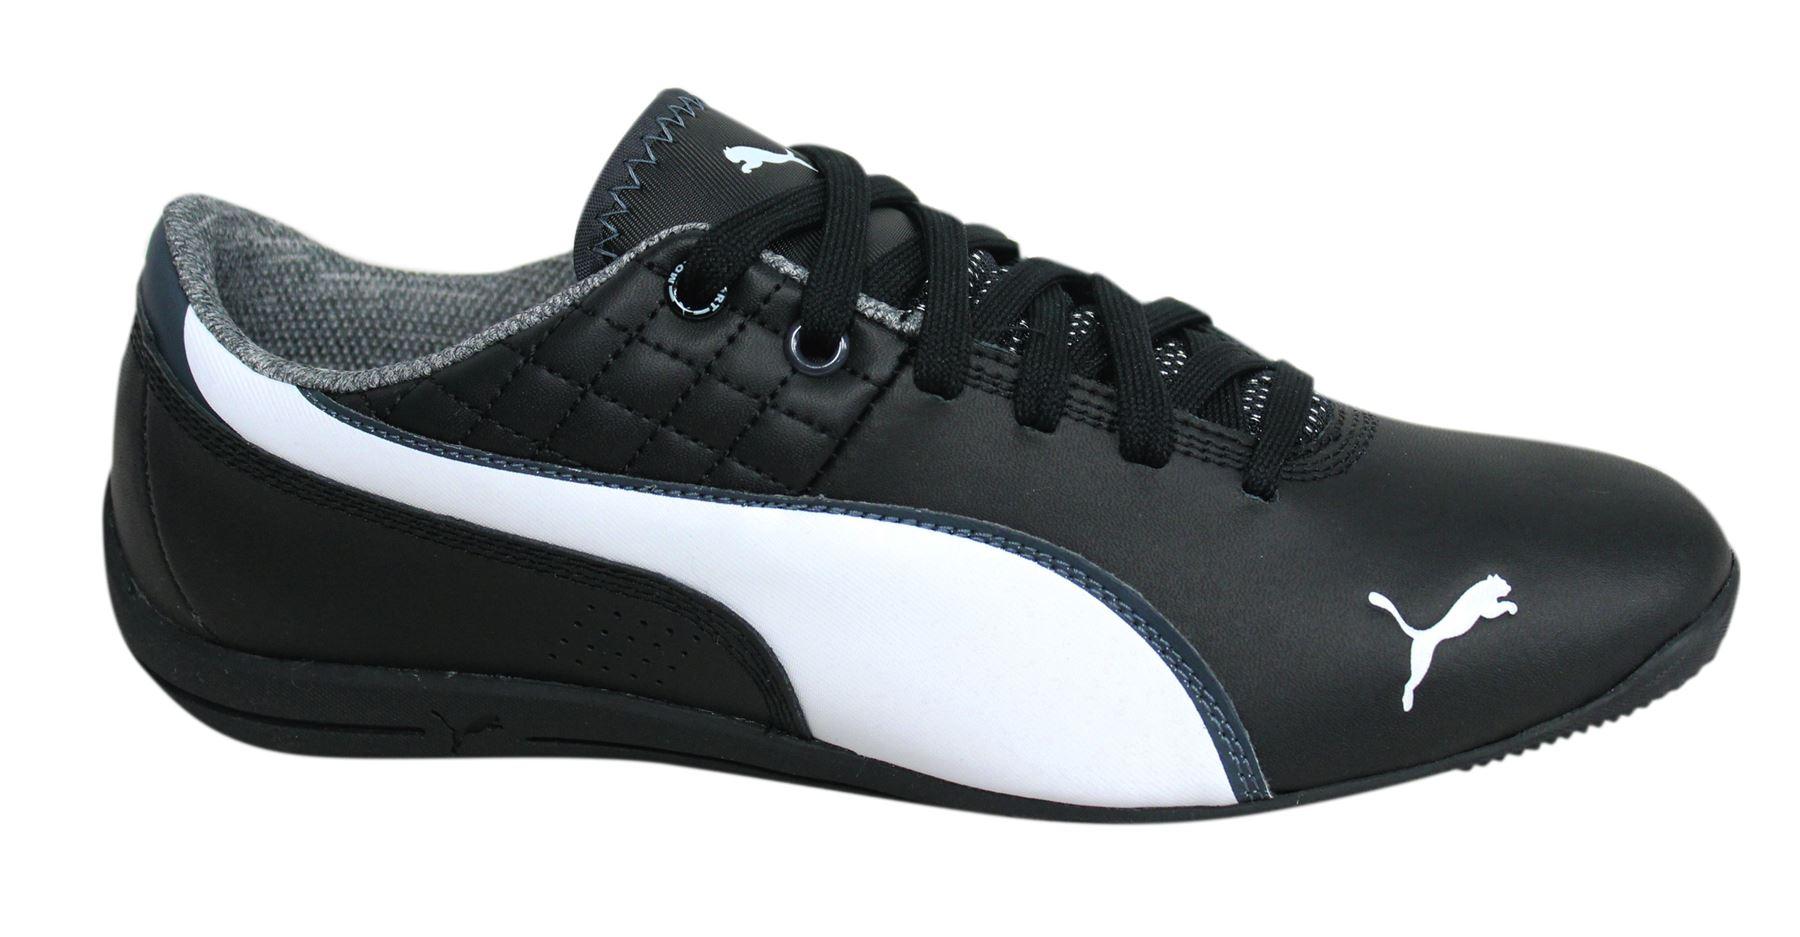 Puma Drift Cat NM Lace Up Black Leather Mens Trainers 305523 01 U86